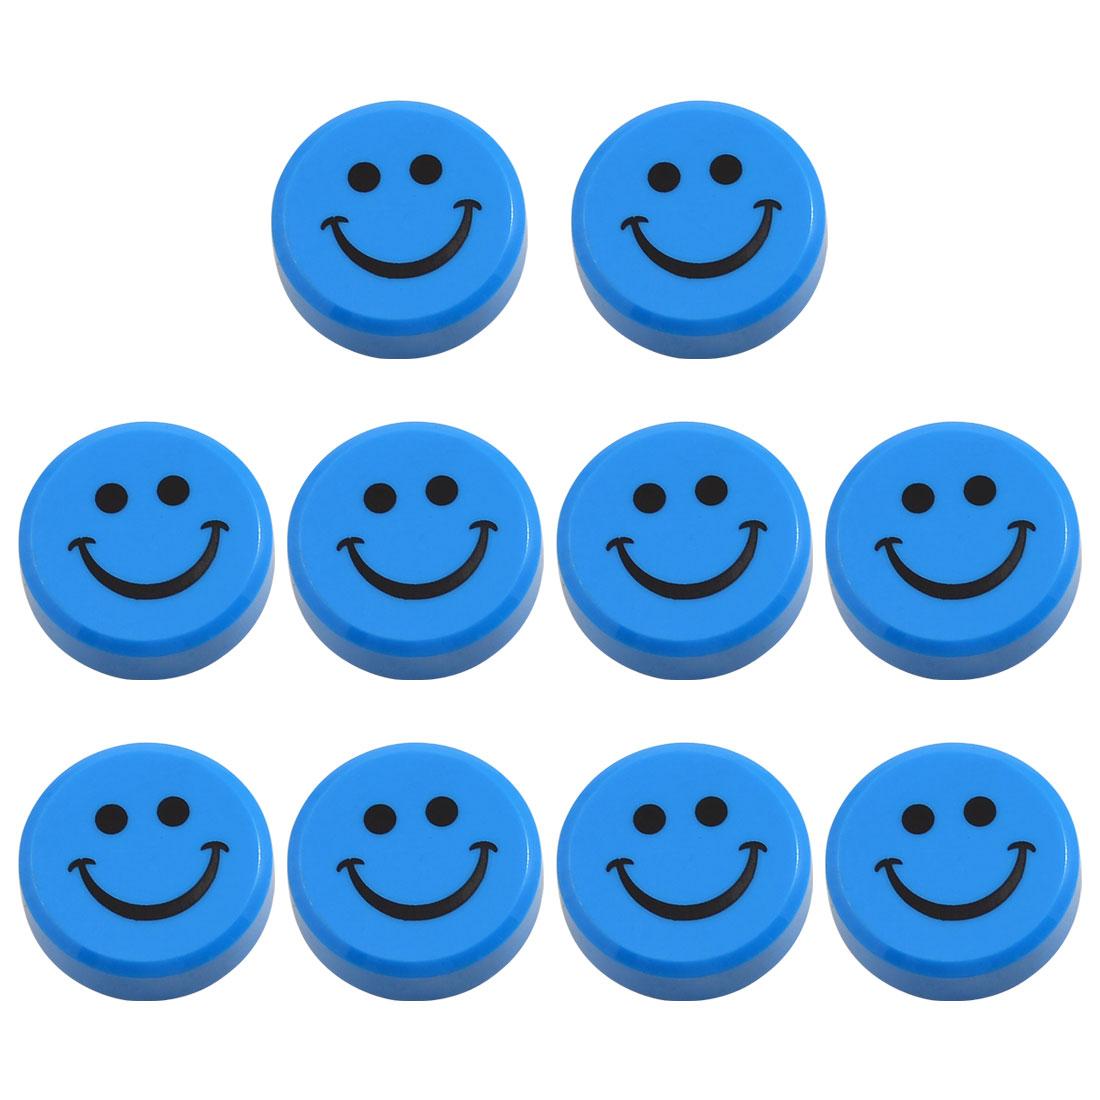 "10 x 1.2"" Dia Smile Face Pattern Blue Shell Fridge Magnets Home Decor"